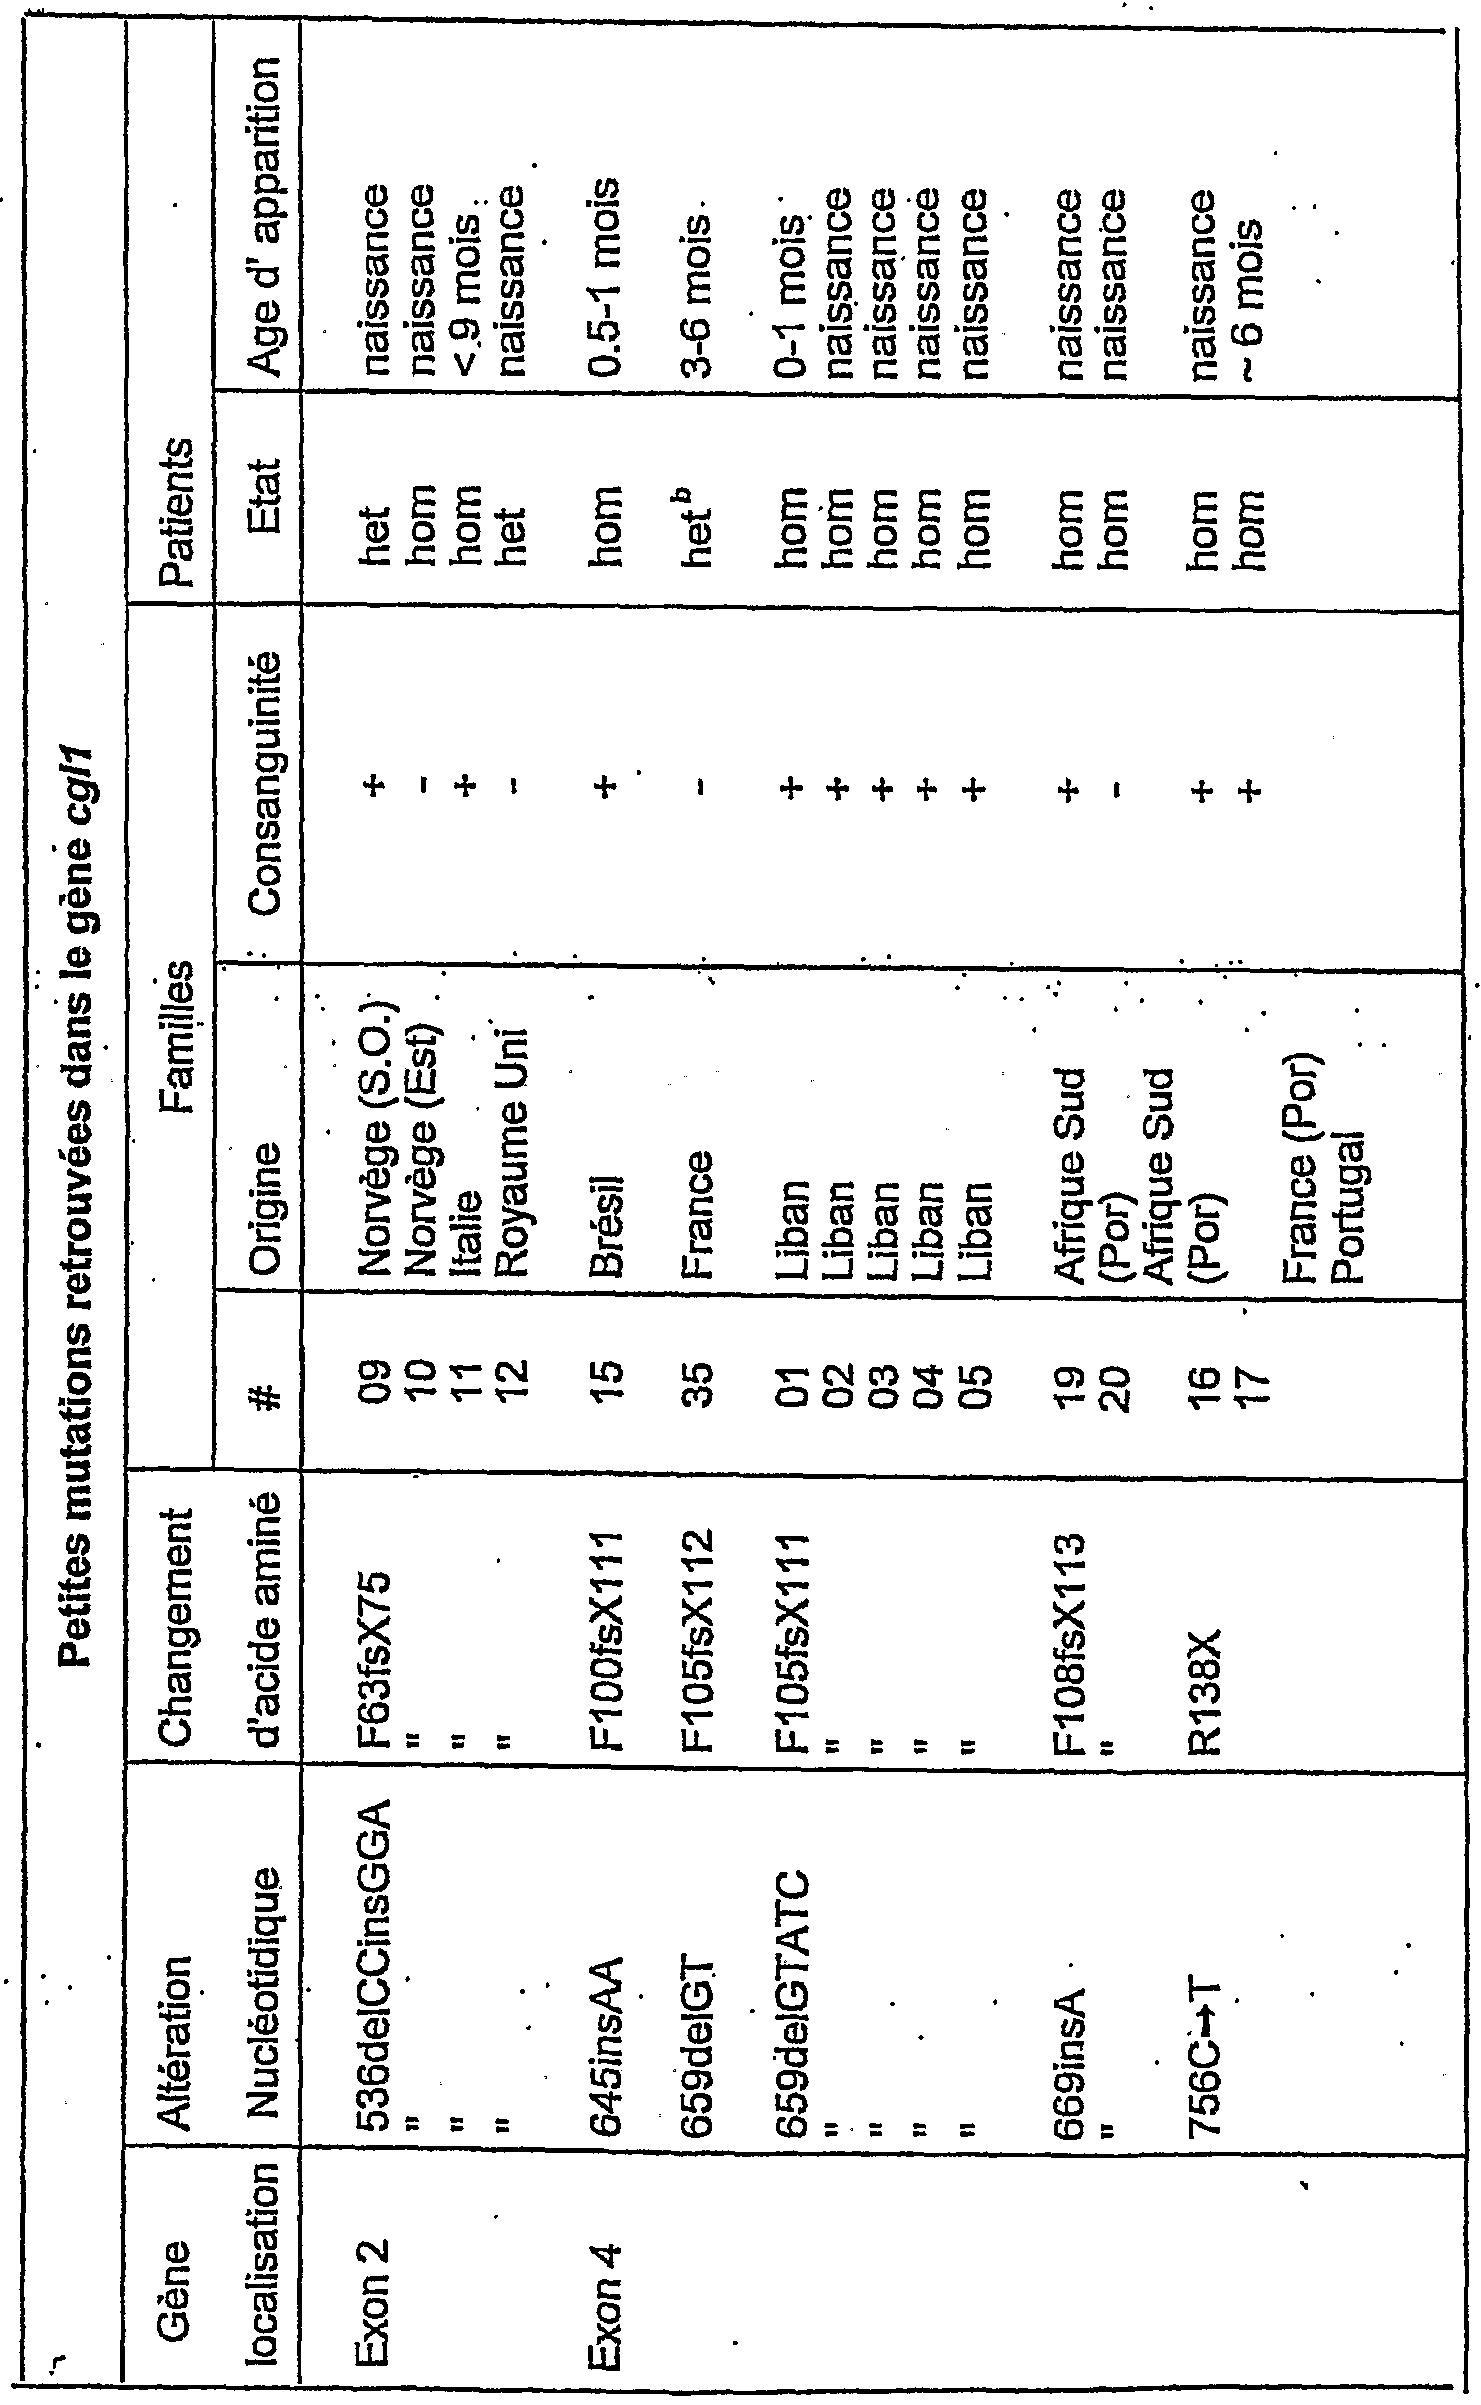 Datation Scan ce qui ne signifie CRL